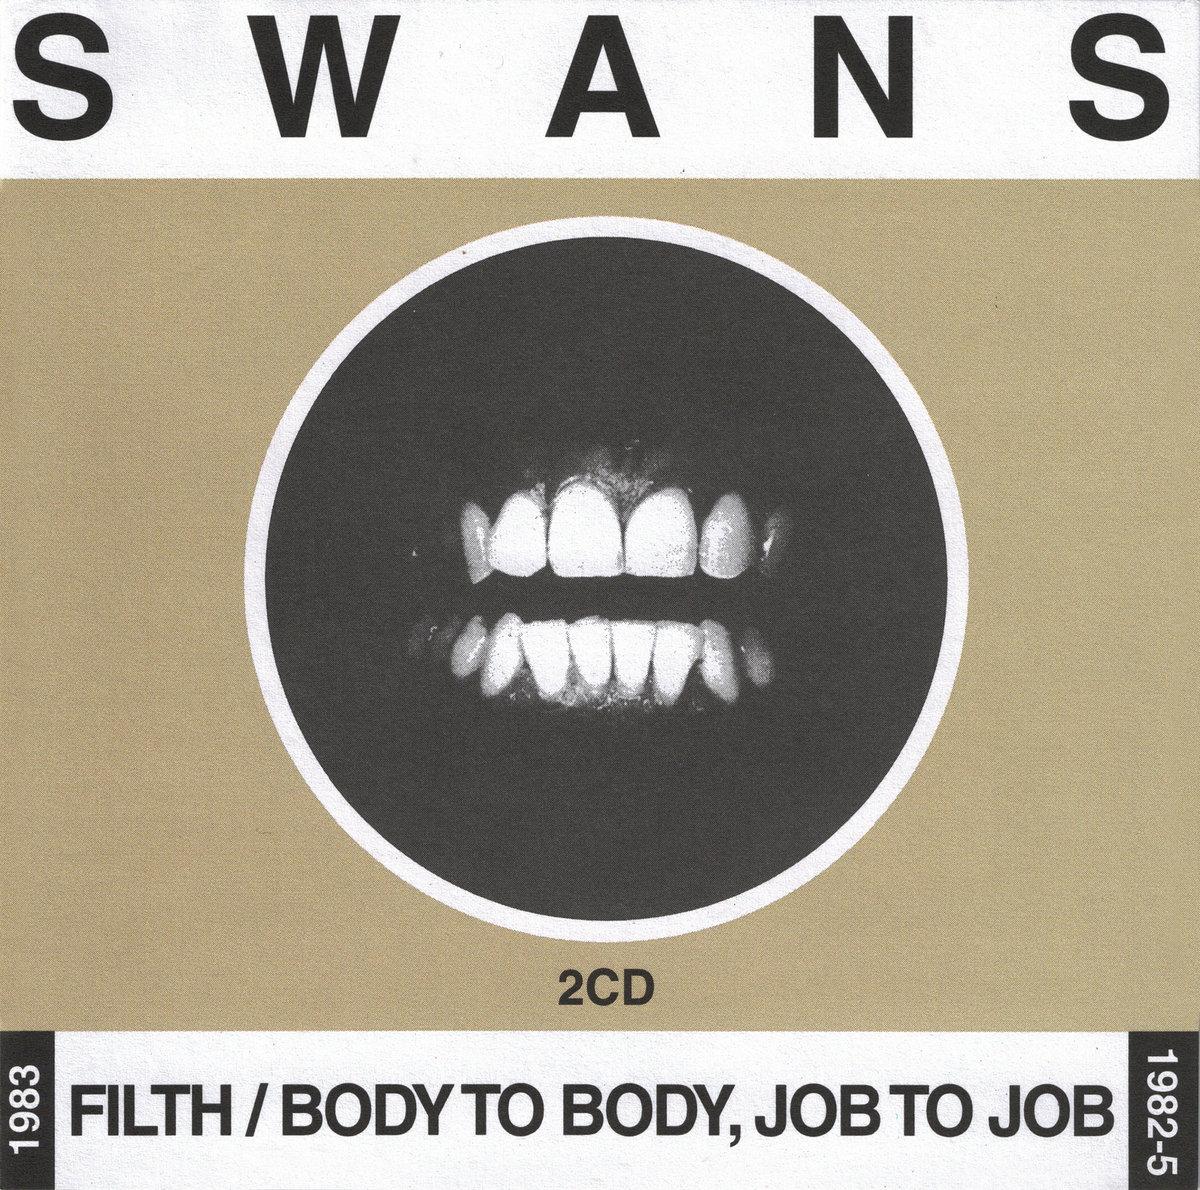 Swans - Página 12 A1213692473_10